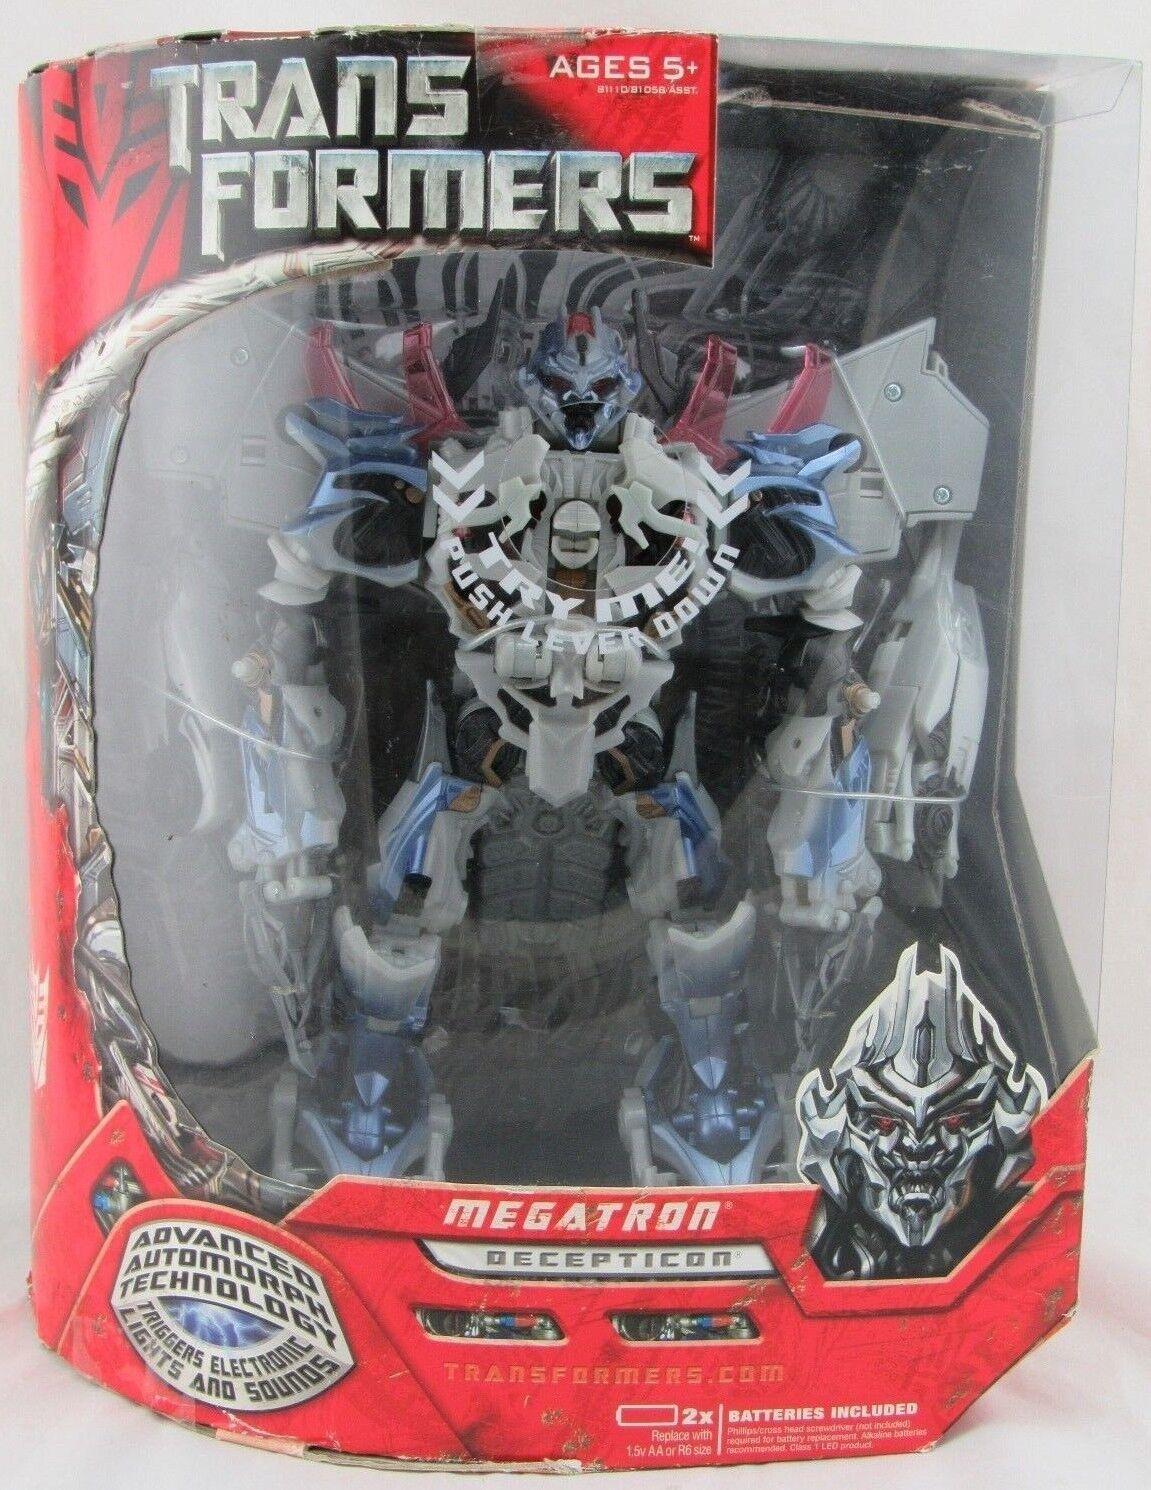 Transformers Leader Class Megatron Decepticon, 2007 Hasbro